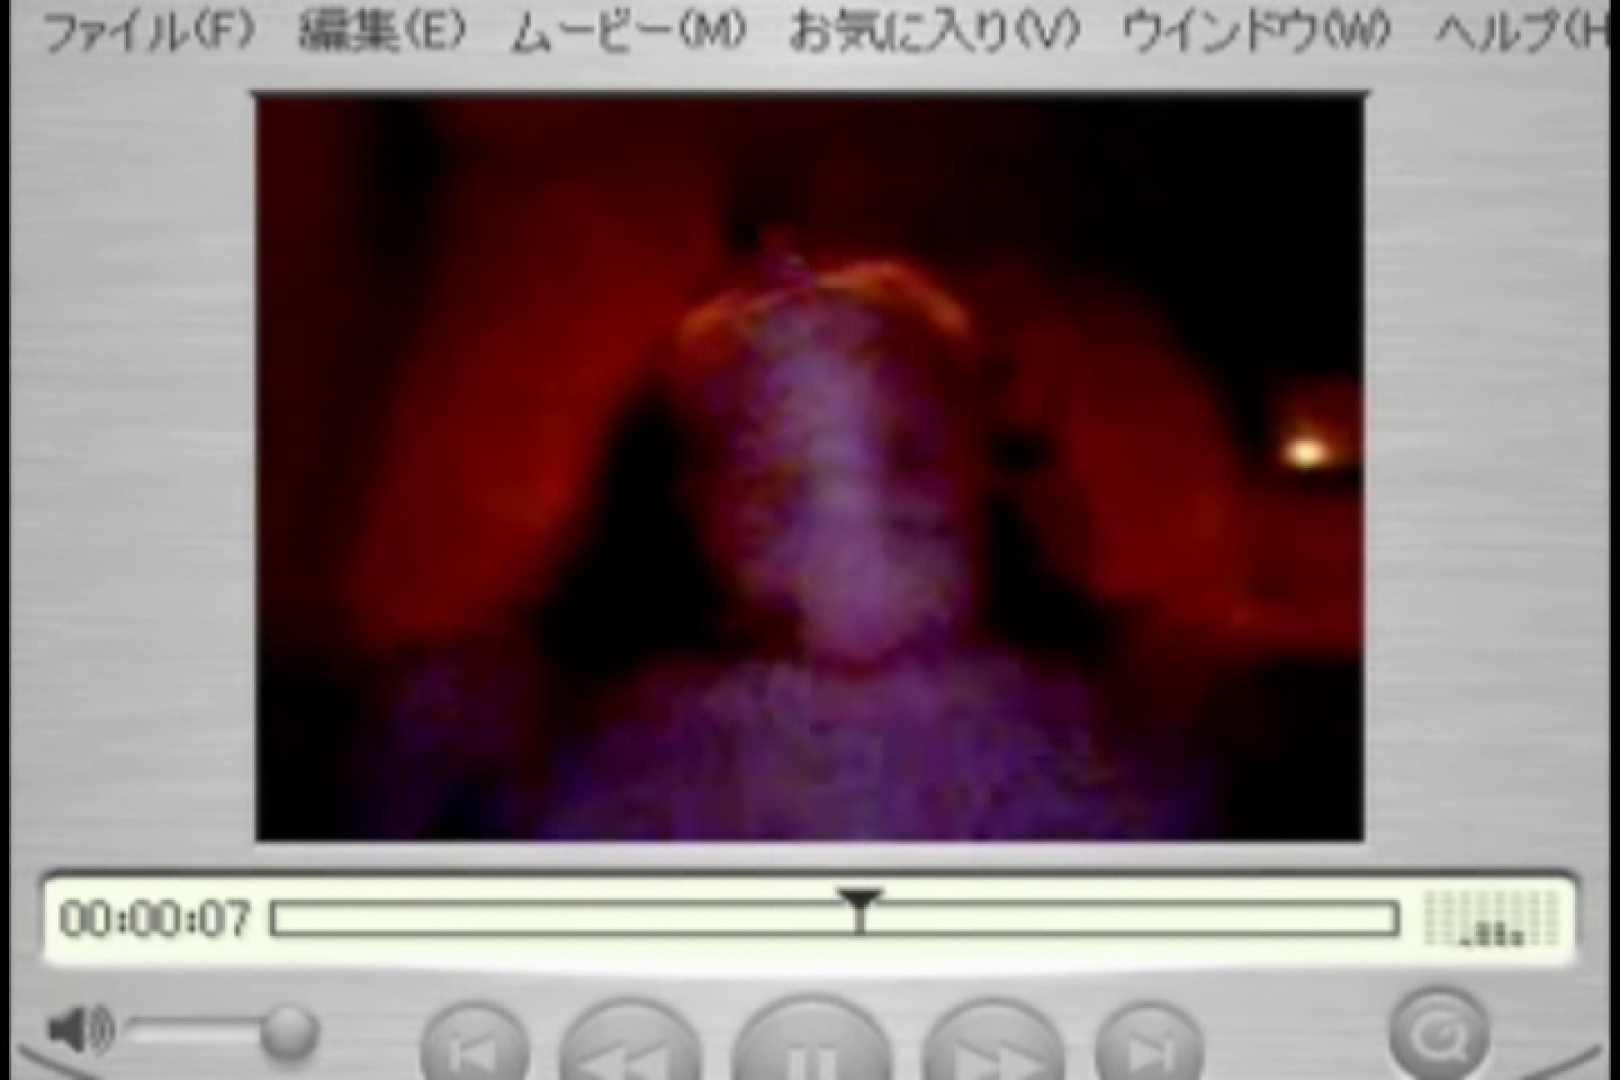 Shigeruのアルバム 流出作品  98pic 44